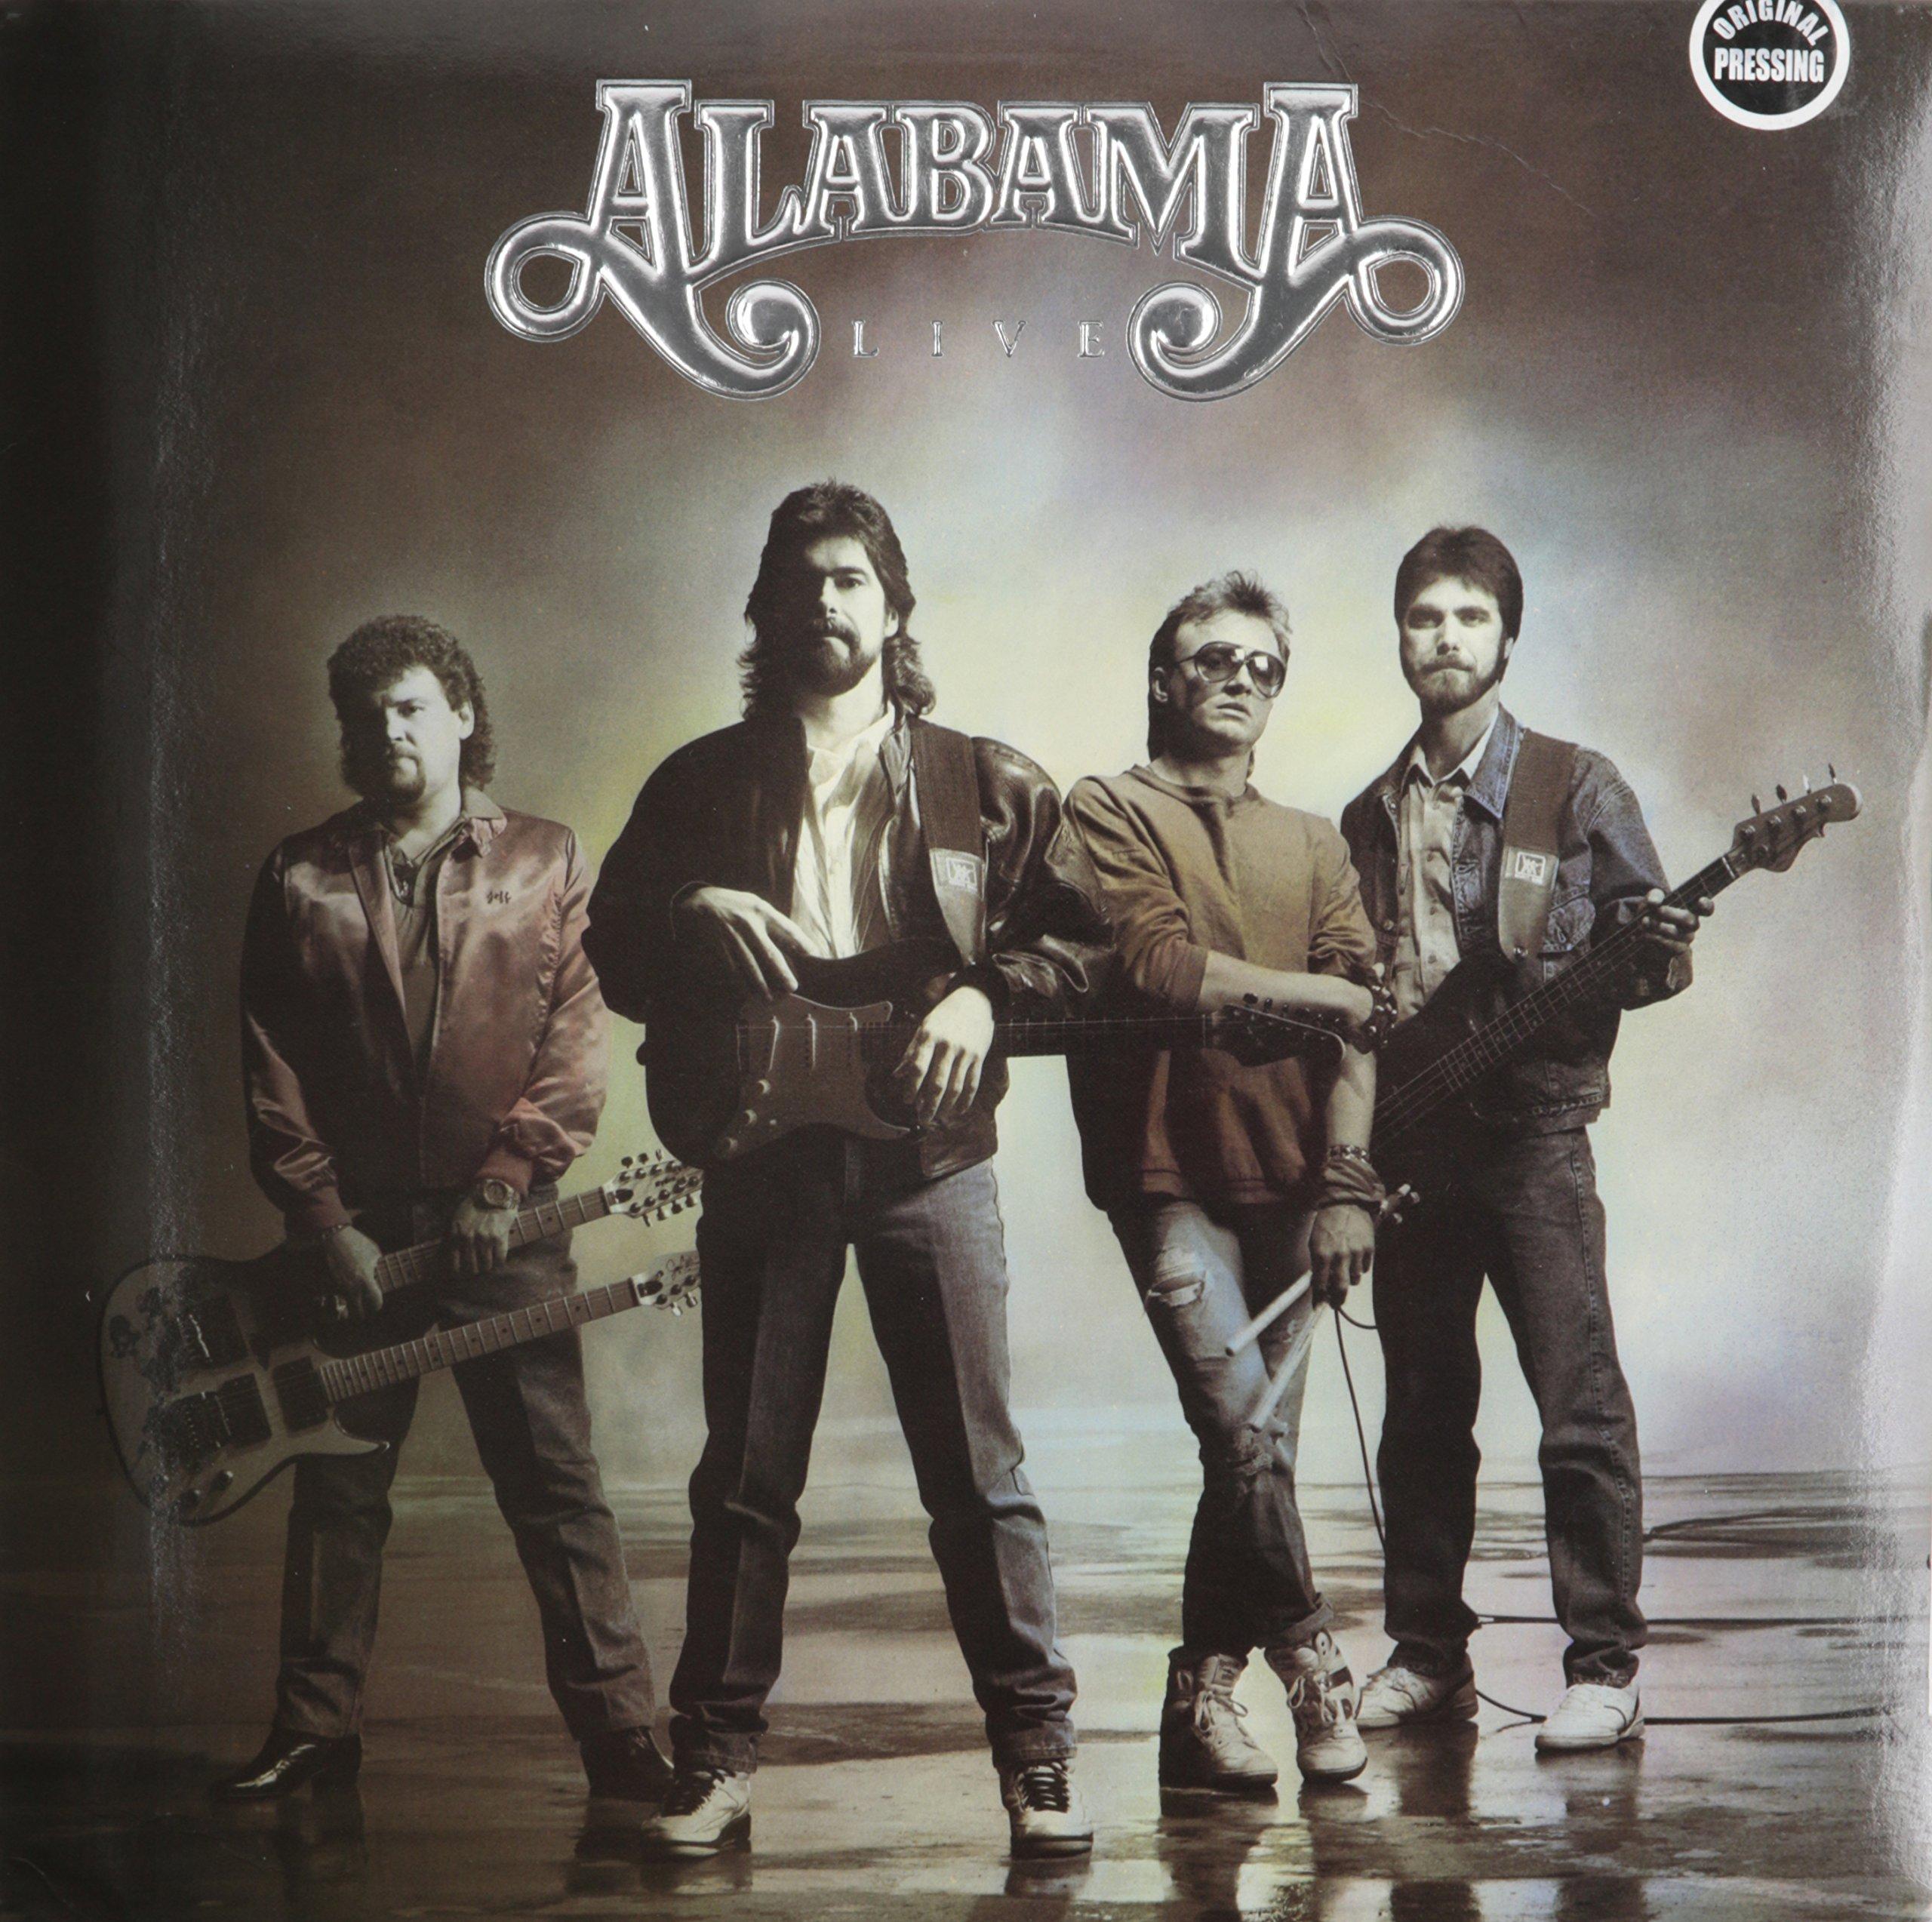 Live: Alabama by Jdc Records